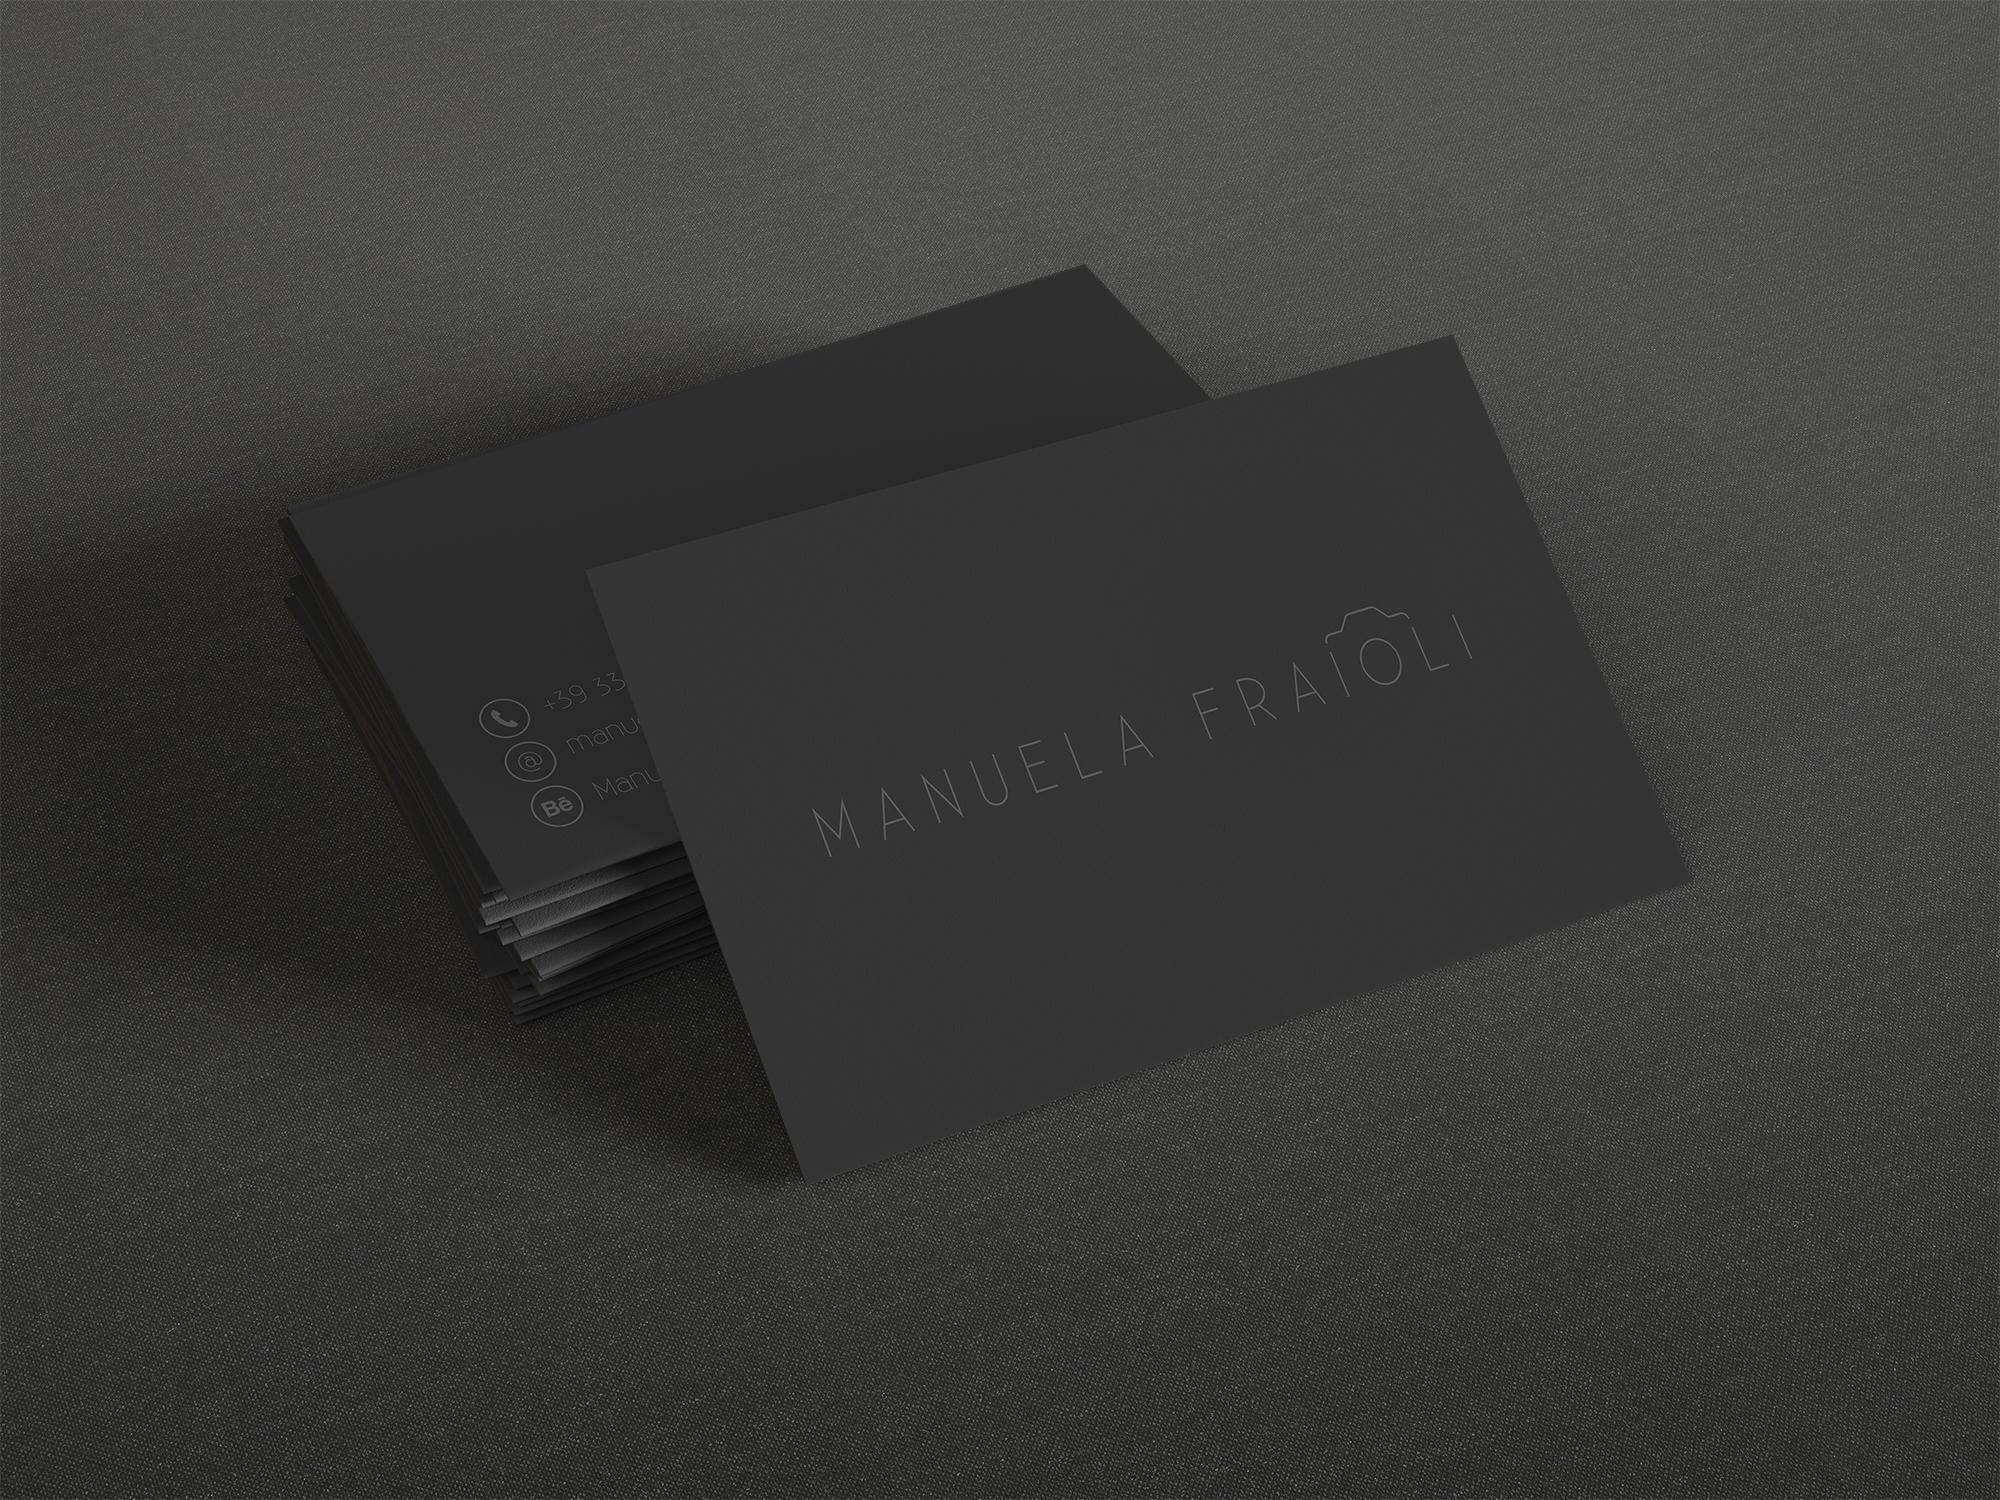 Manuela Fraioli / business card